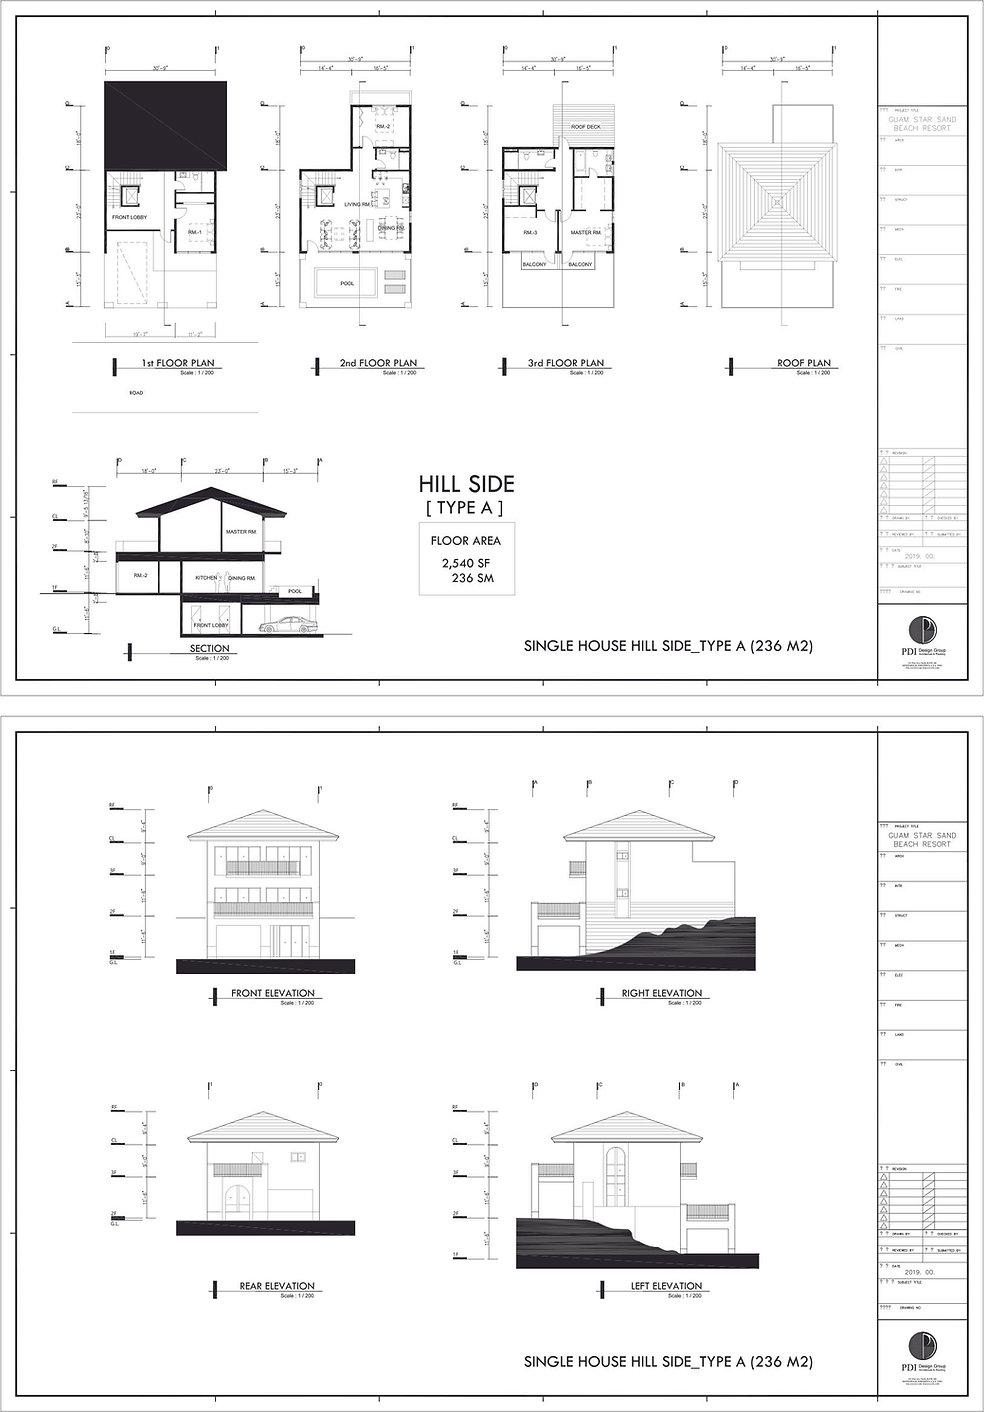 single house.jpg